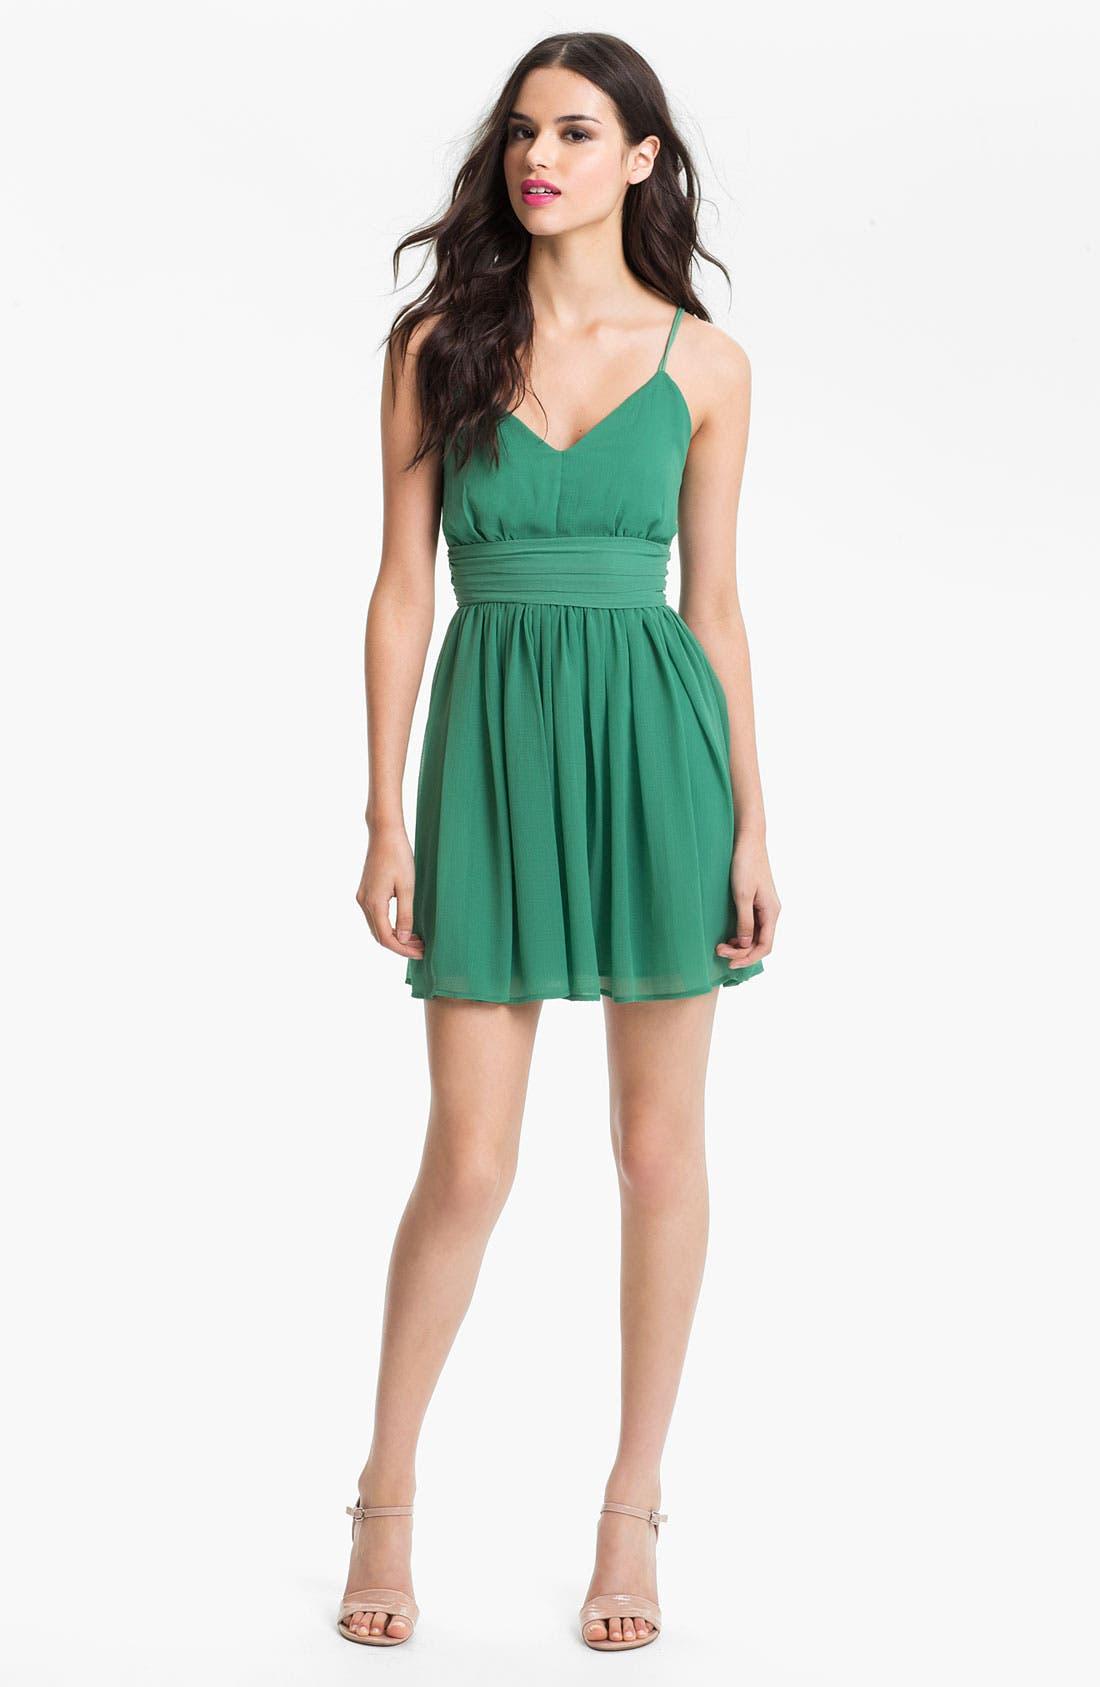 Alternate Image 1 Selected - BB Dakota 'Edie' Spaghetti Strap Chiffon Dress